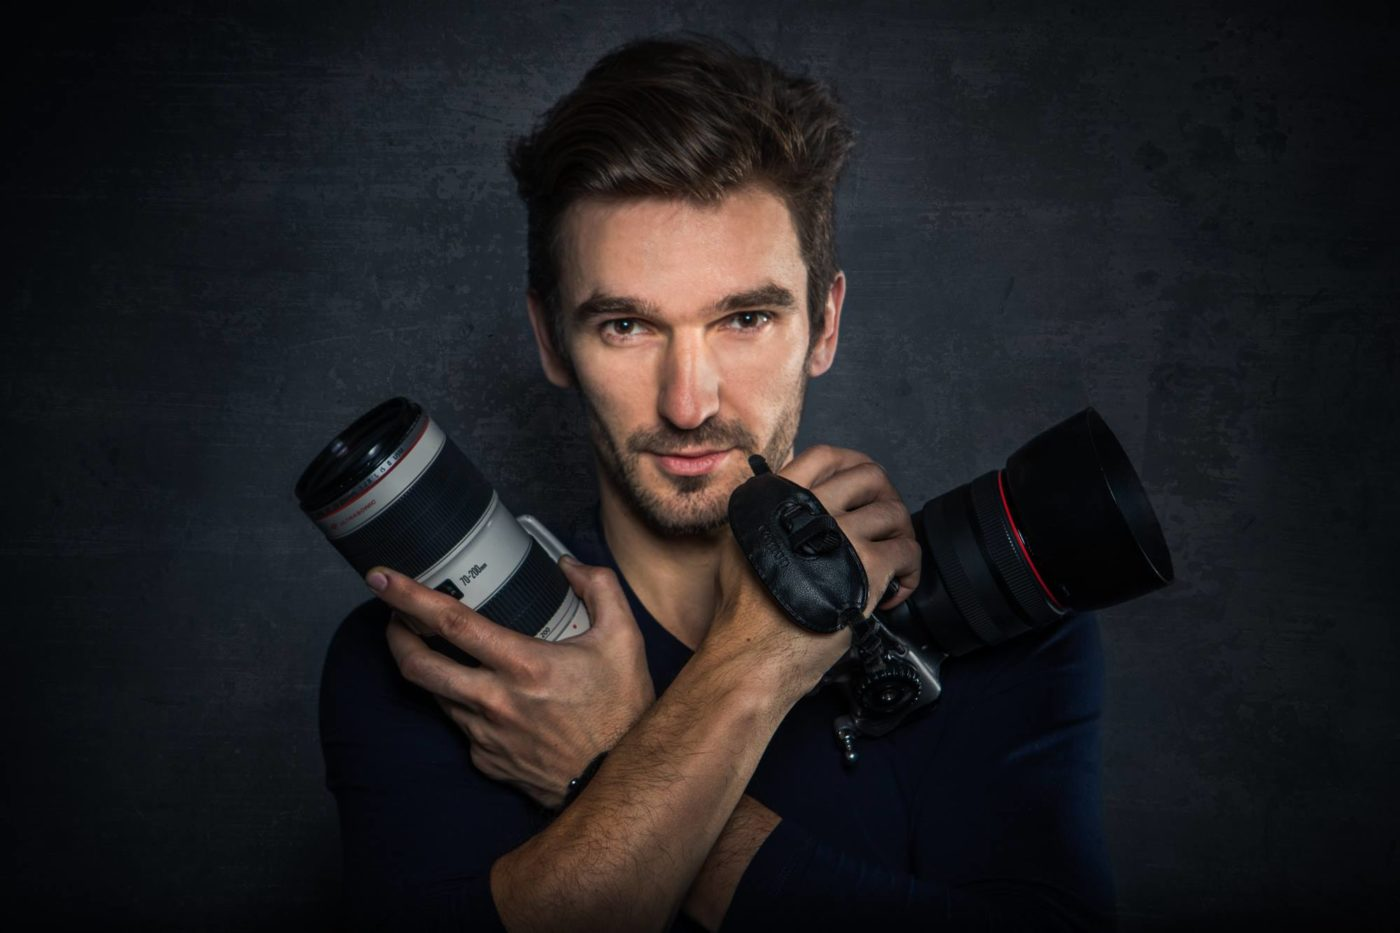 Danylo-Bobyk-Photography-Equipment